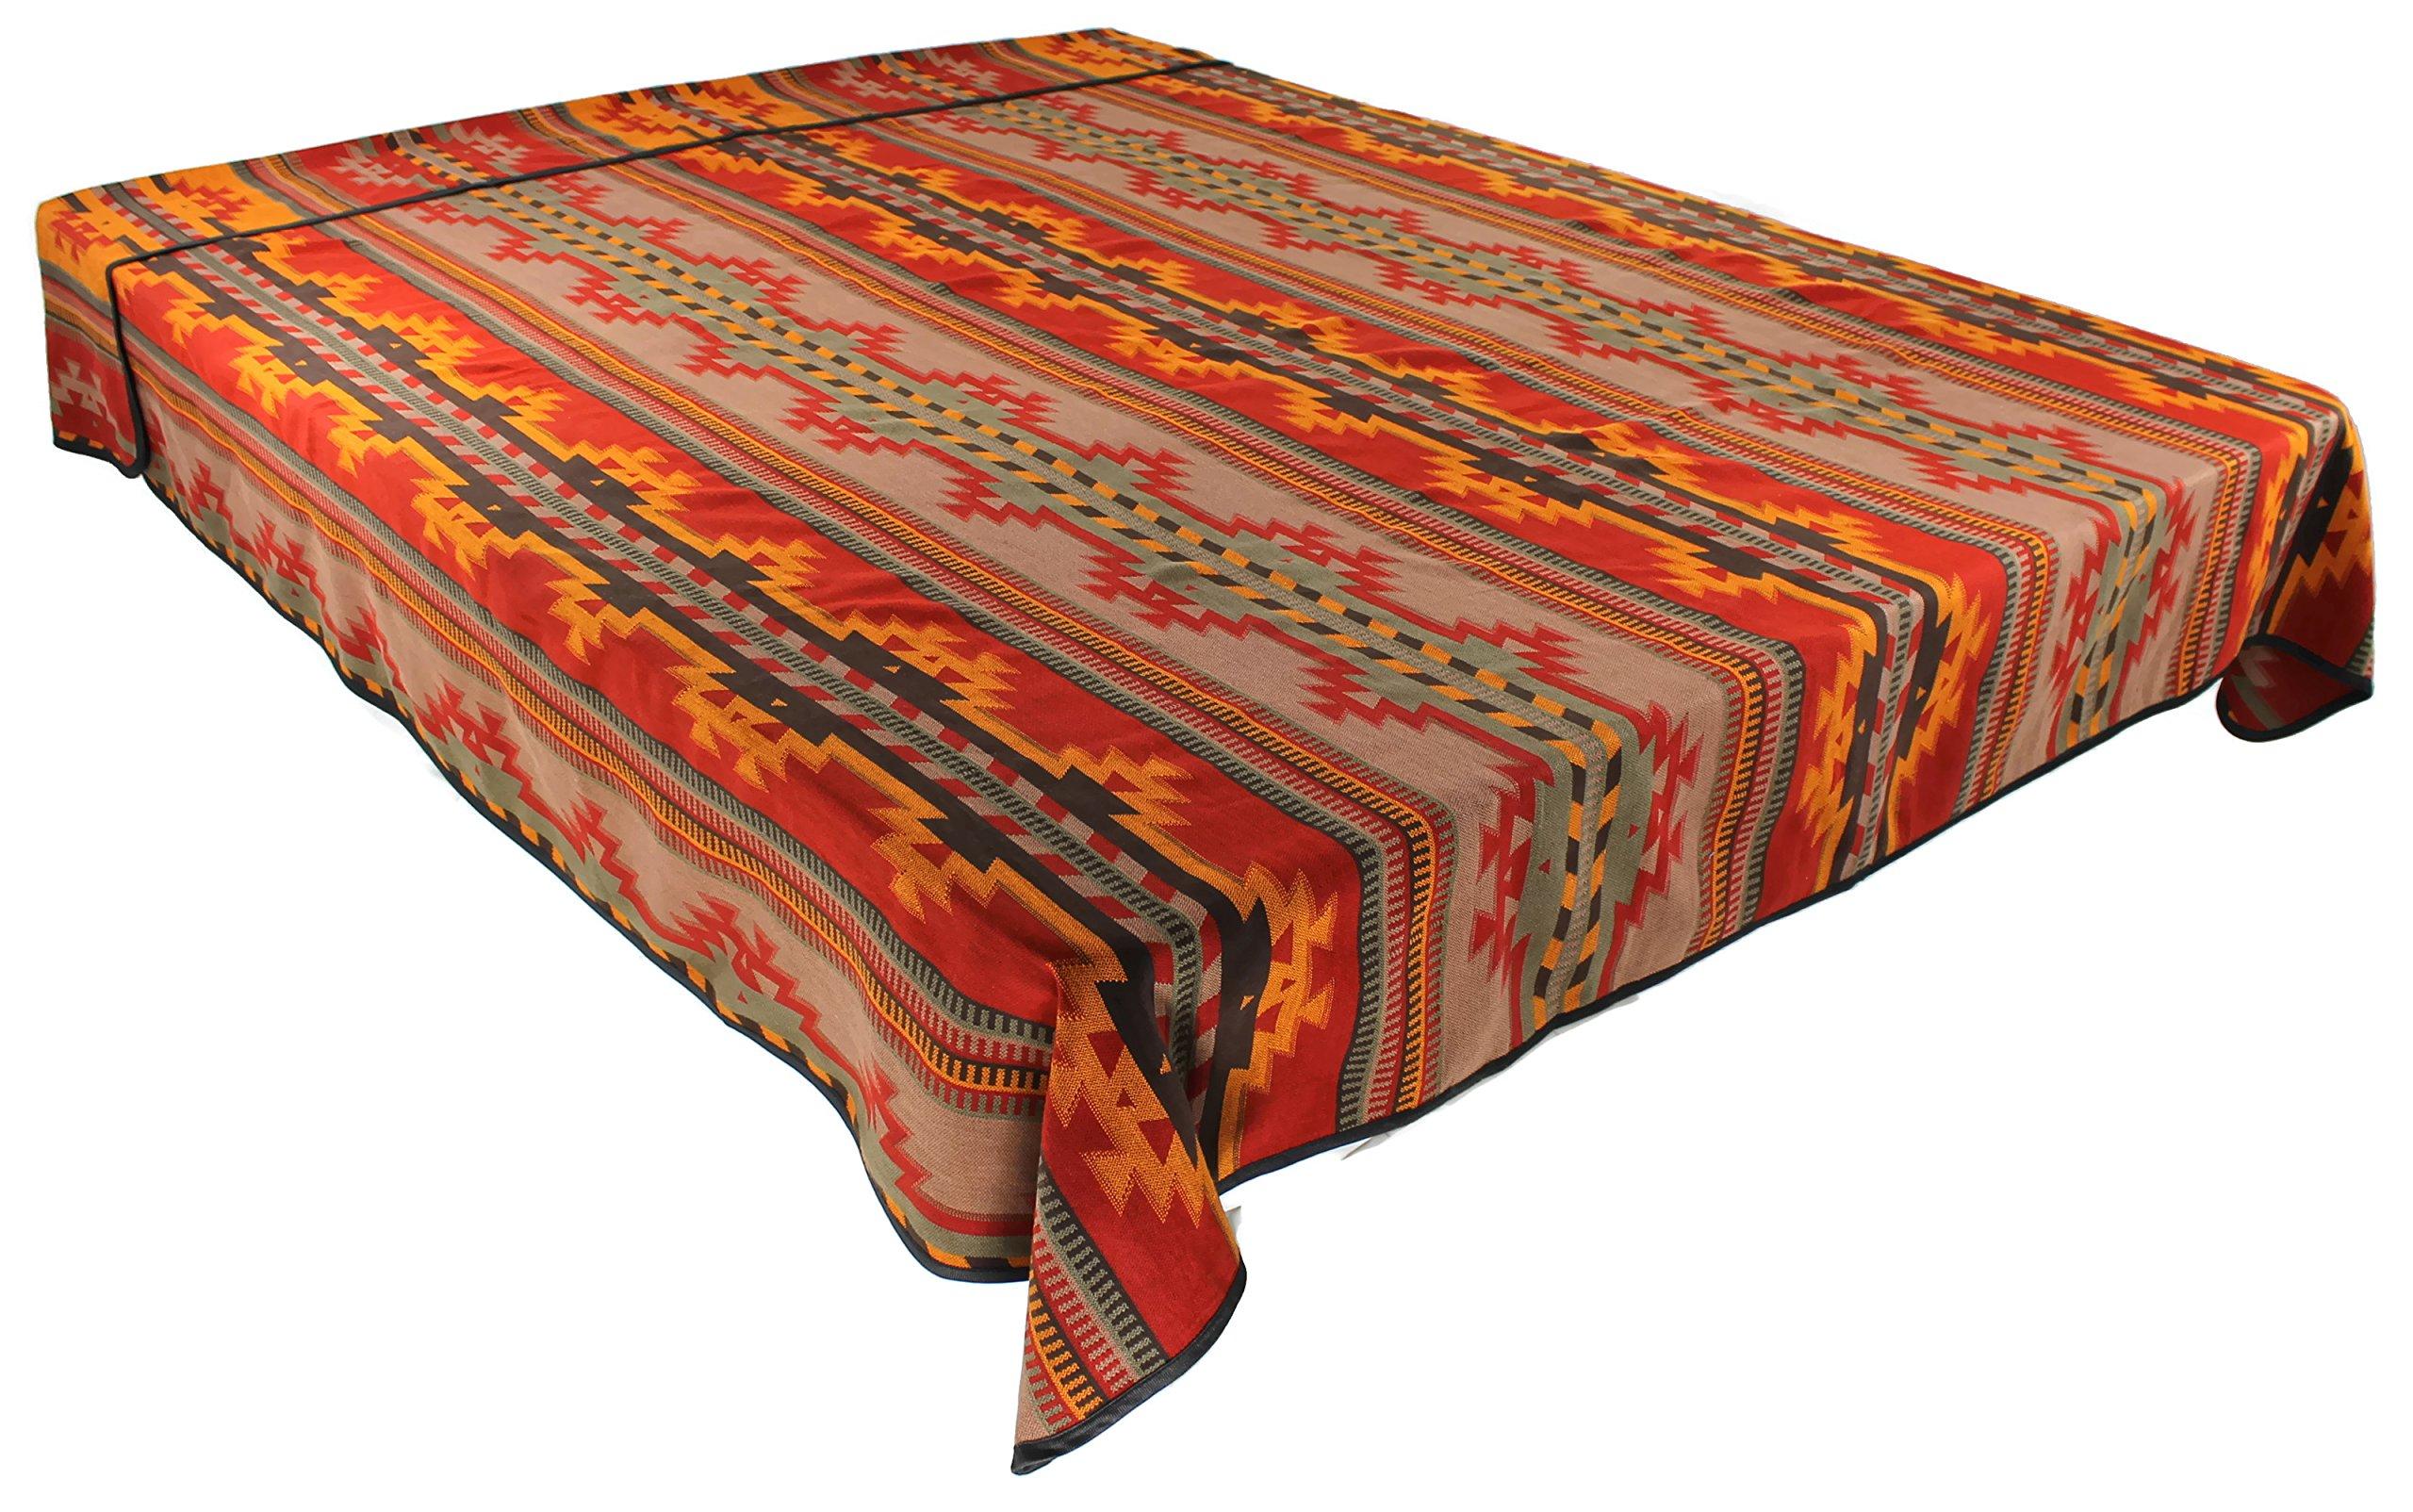 Splendid Exchange Southwestern Bedding Bonita Collection, Mix and Match, King Size Reversible Bedspread, Bonita Red and Yellow